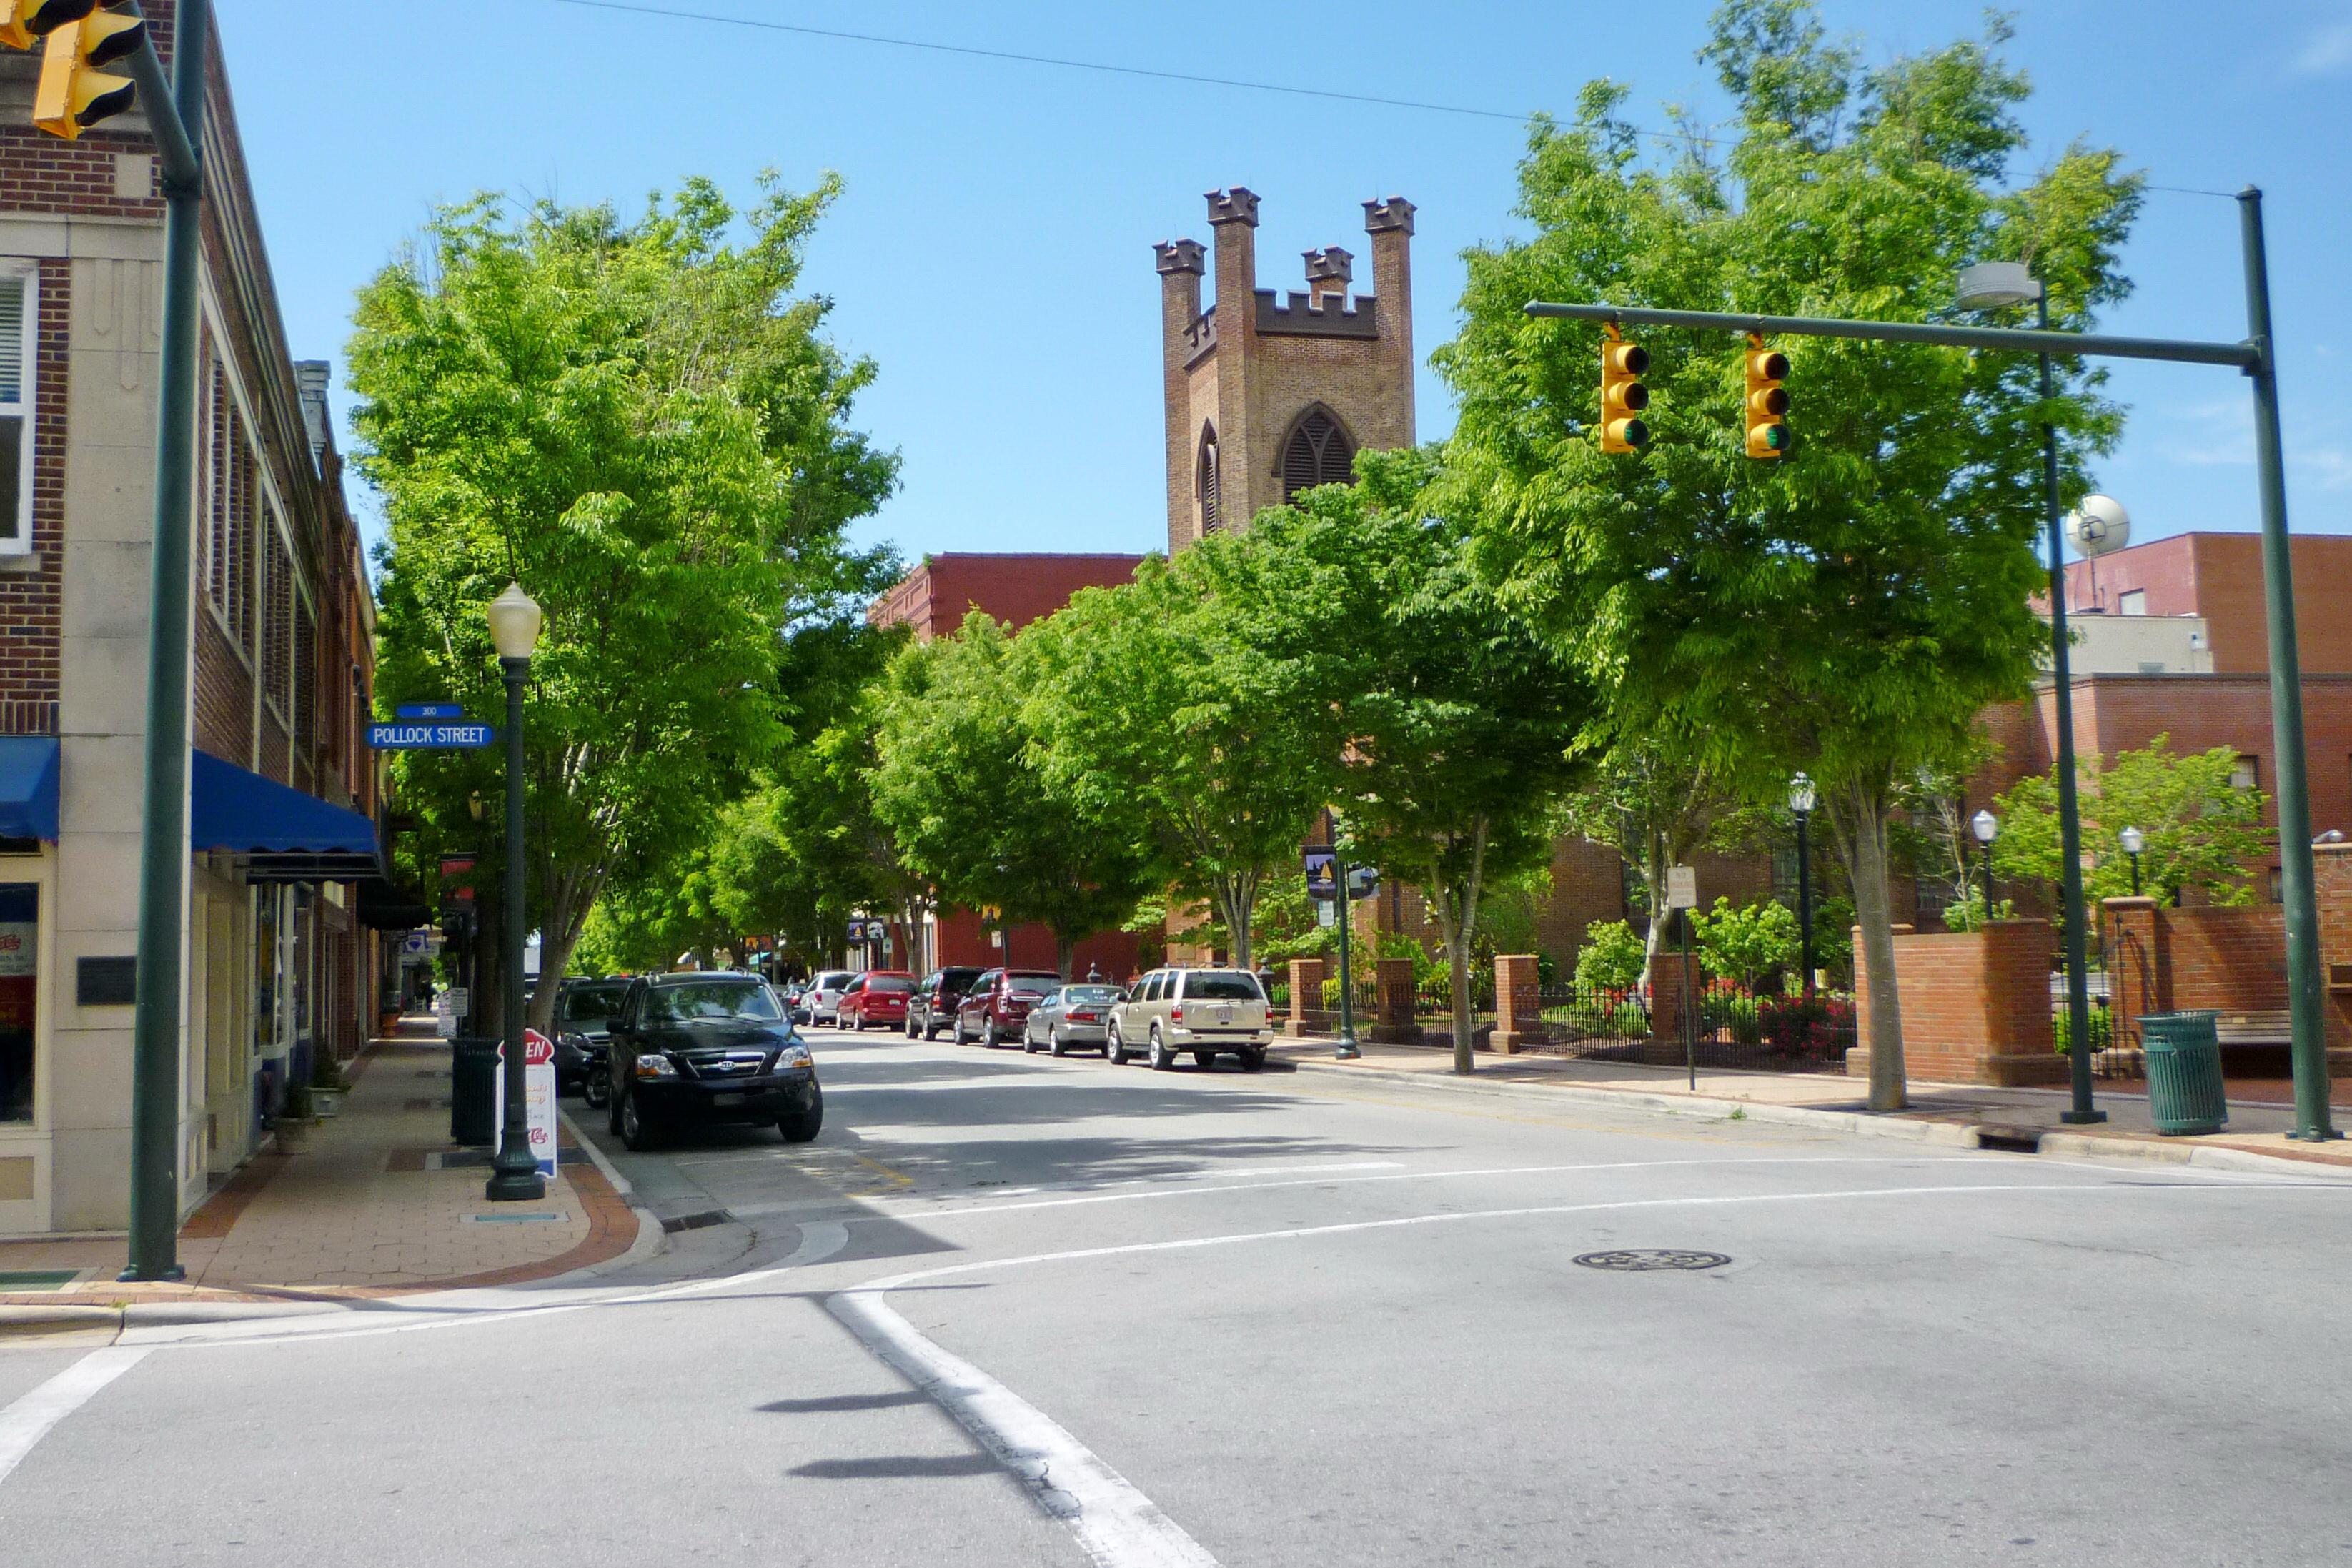 File:New Bern Historic District.JPG